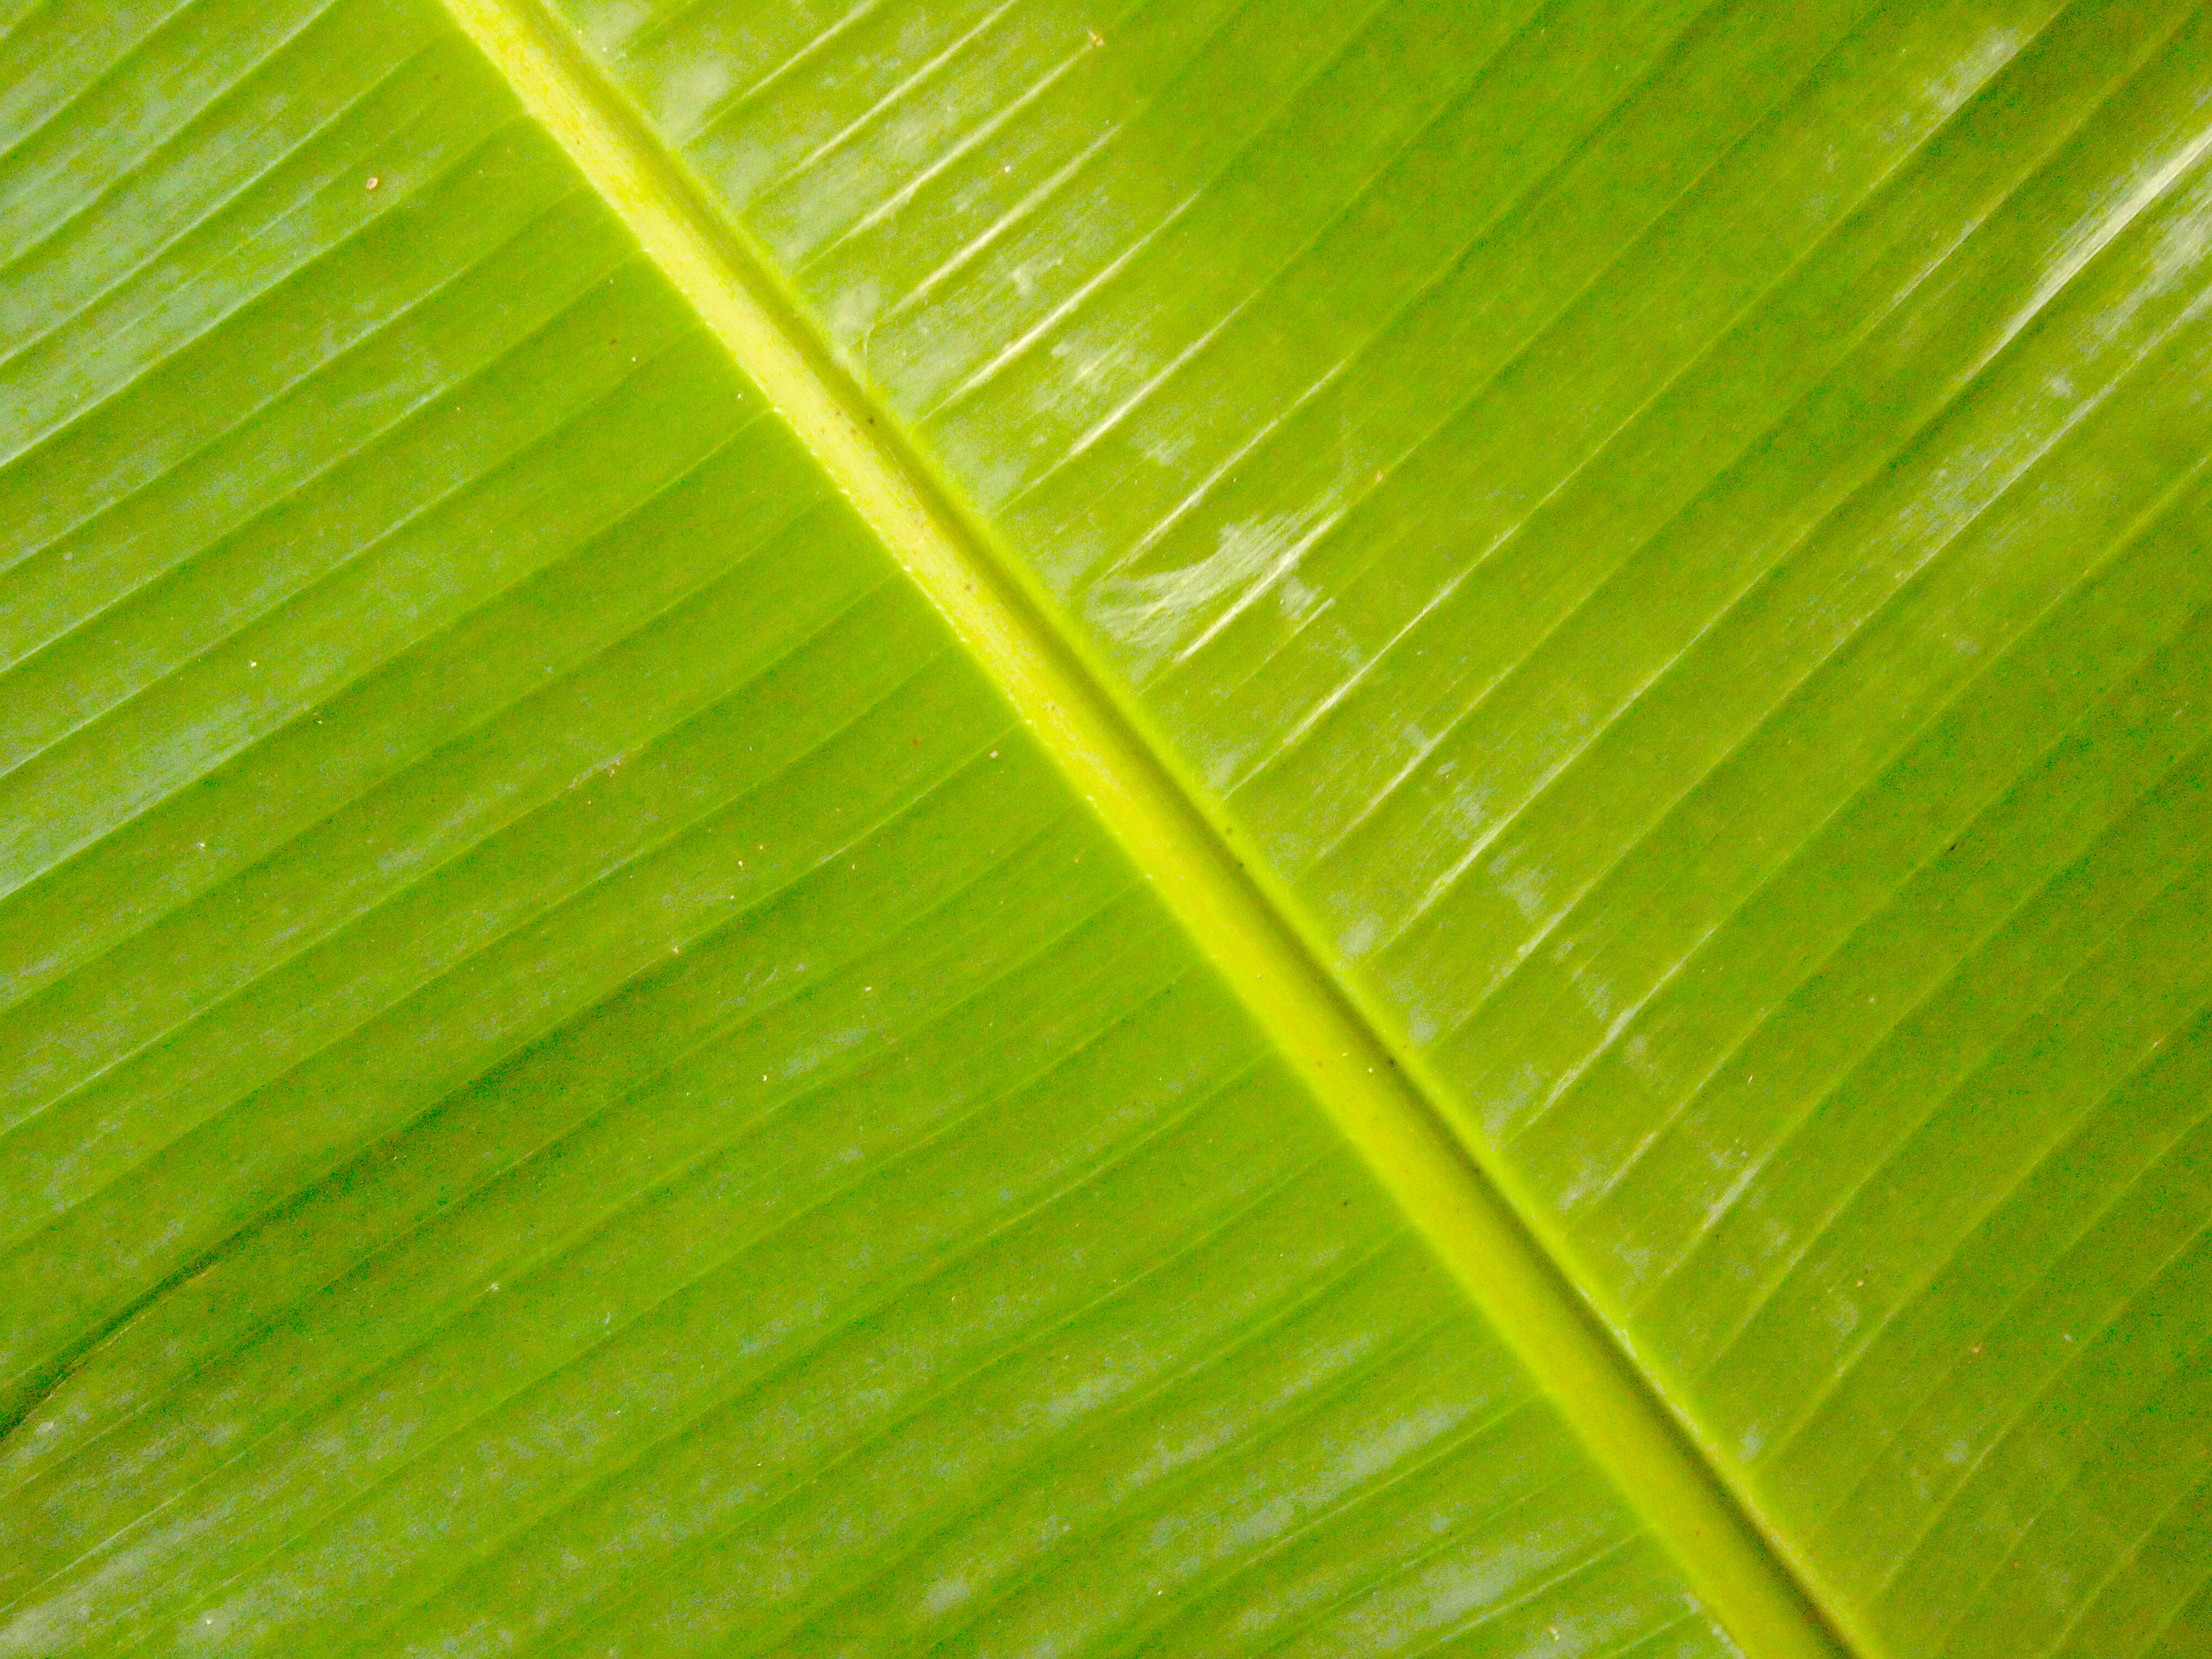 Fall Pictures For Computer Wallpaper Banana Leaf Backgrounds Pixelstalk Net